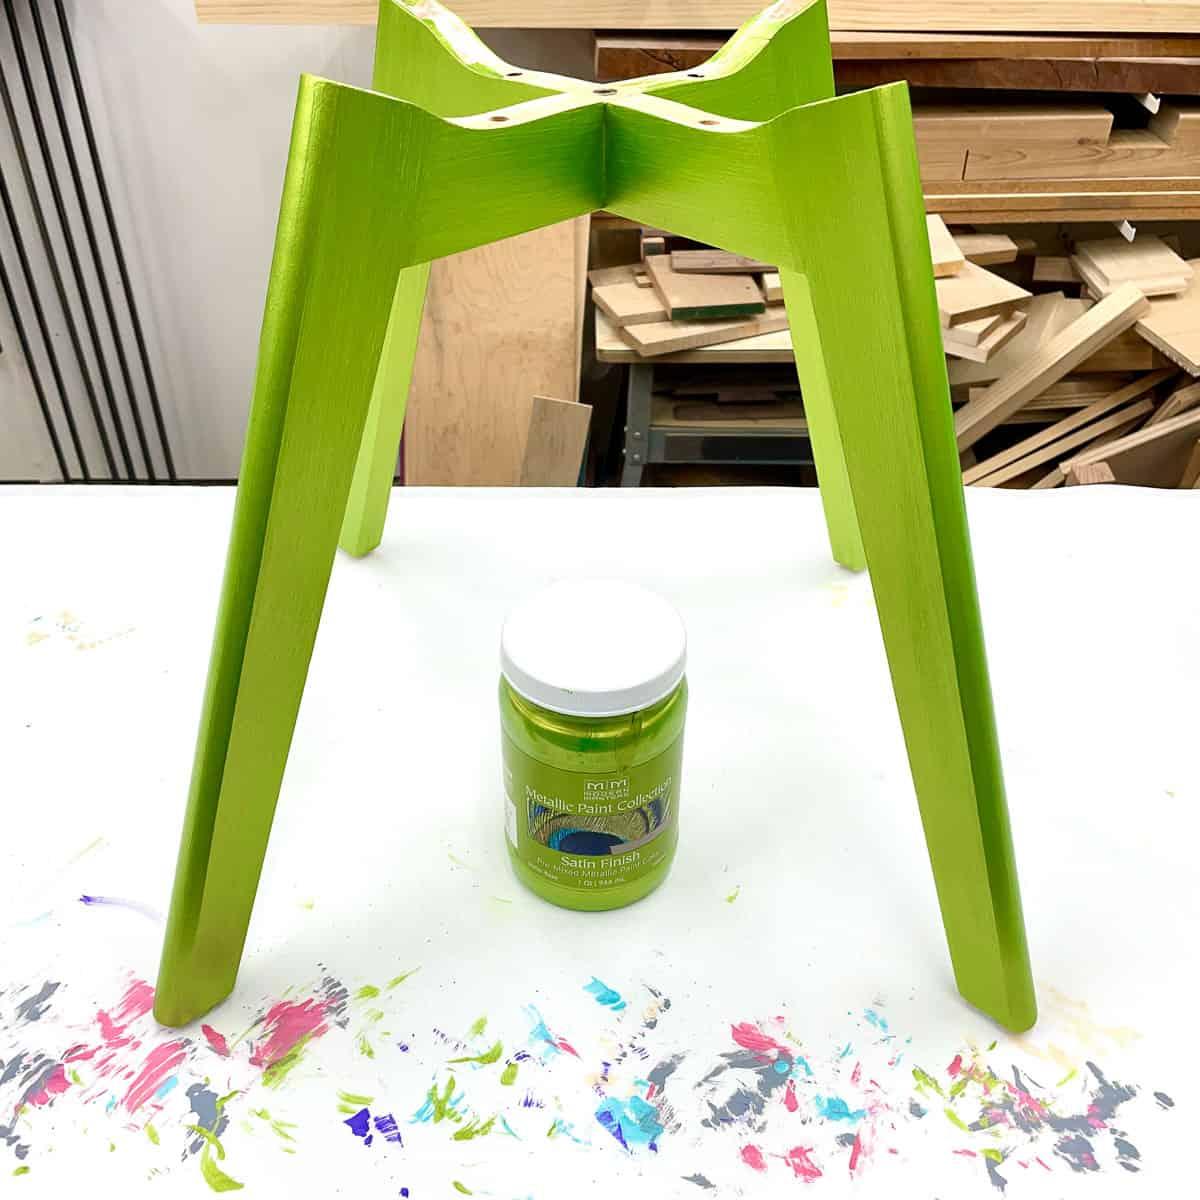 green metallic furniture paint on chair legs